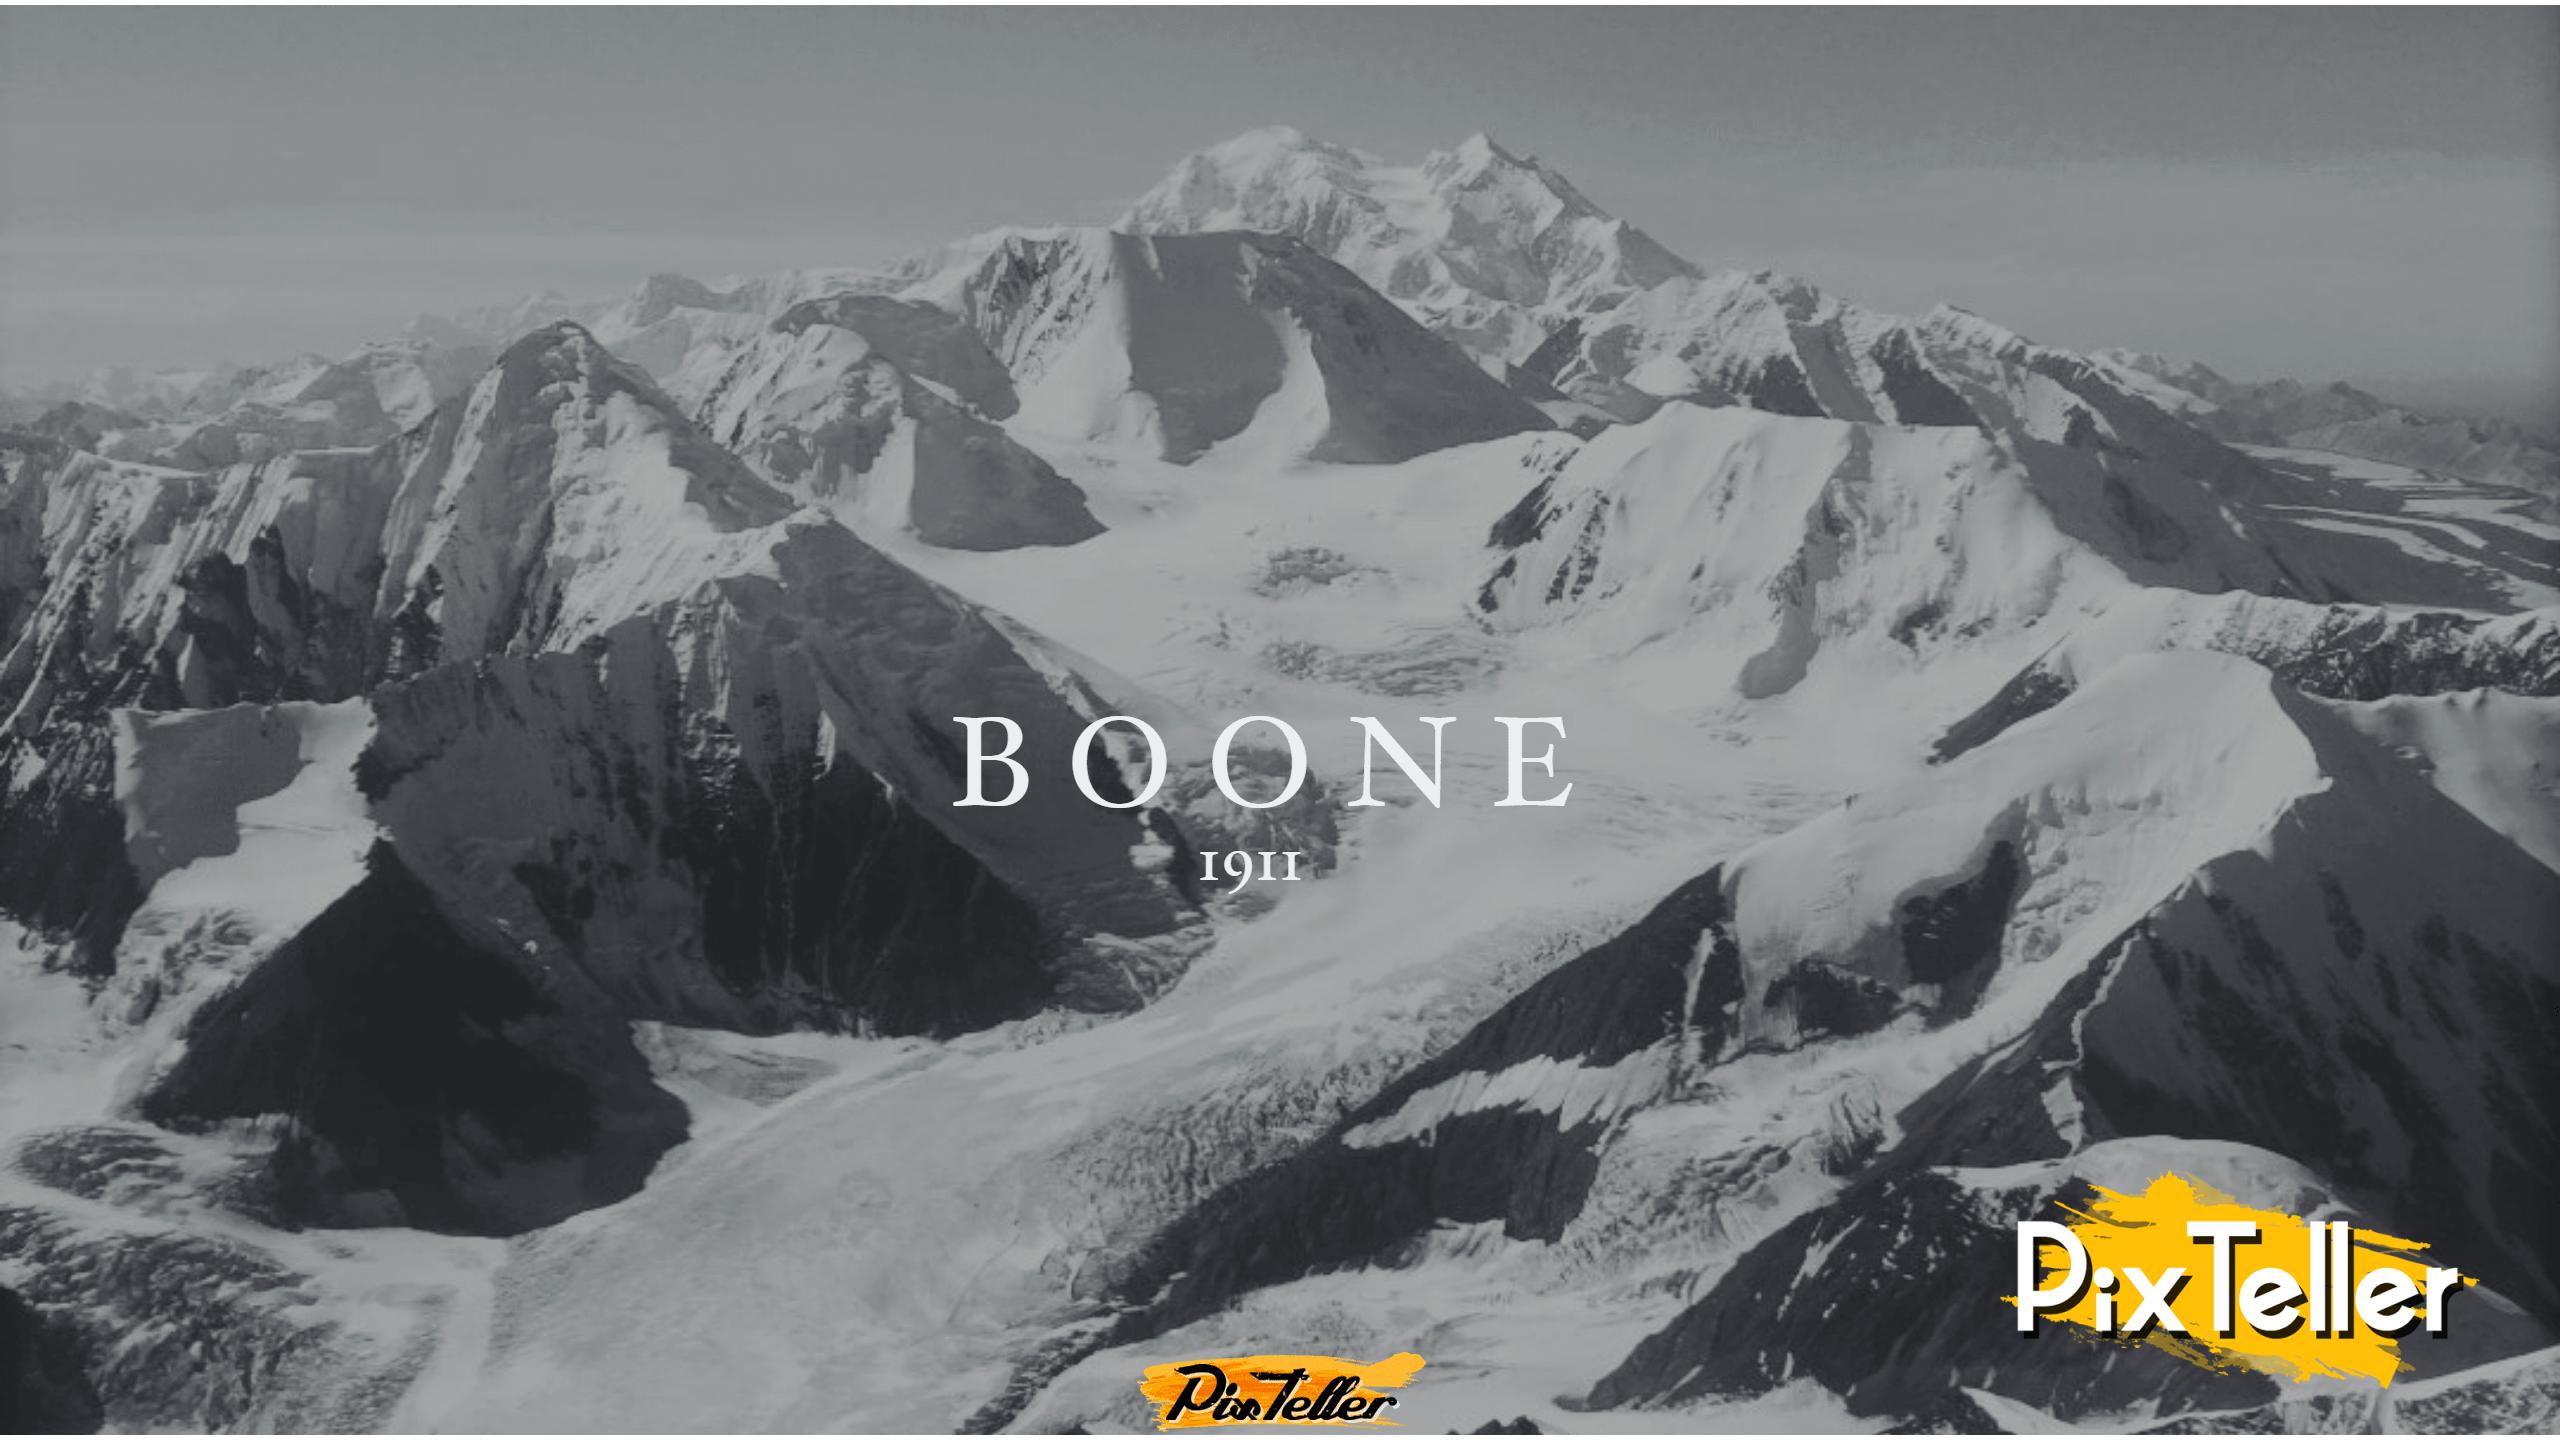 Black,                And,                White,                Mountainous,                Landforms,                Mountain,                Range,                Monochrome,                Photography,                Ridge,                Massif,                Geological,                Phenomenon,                 Free Image